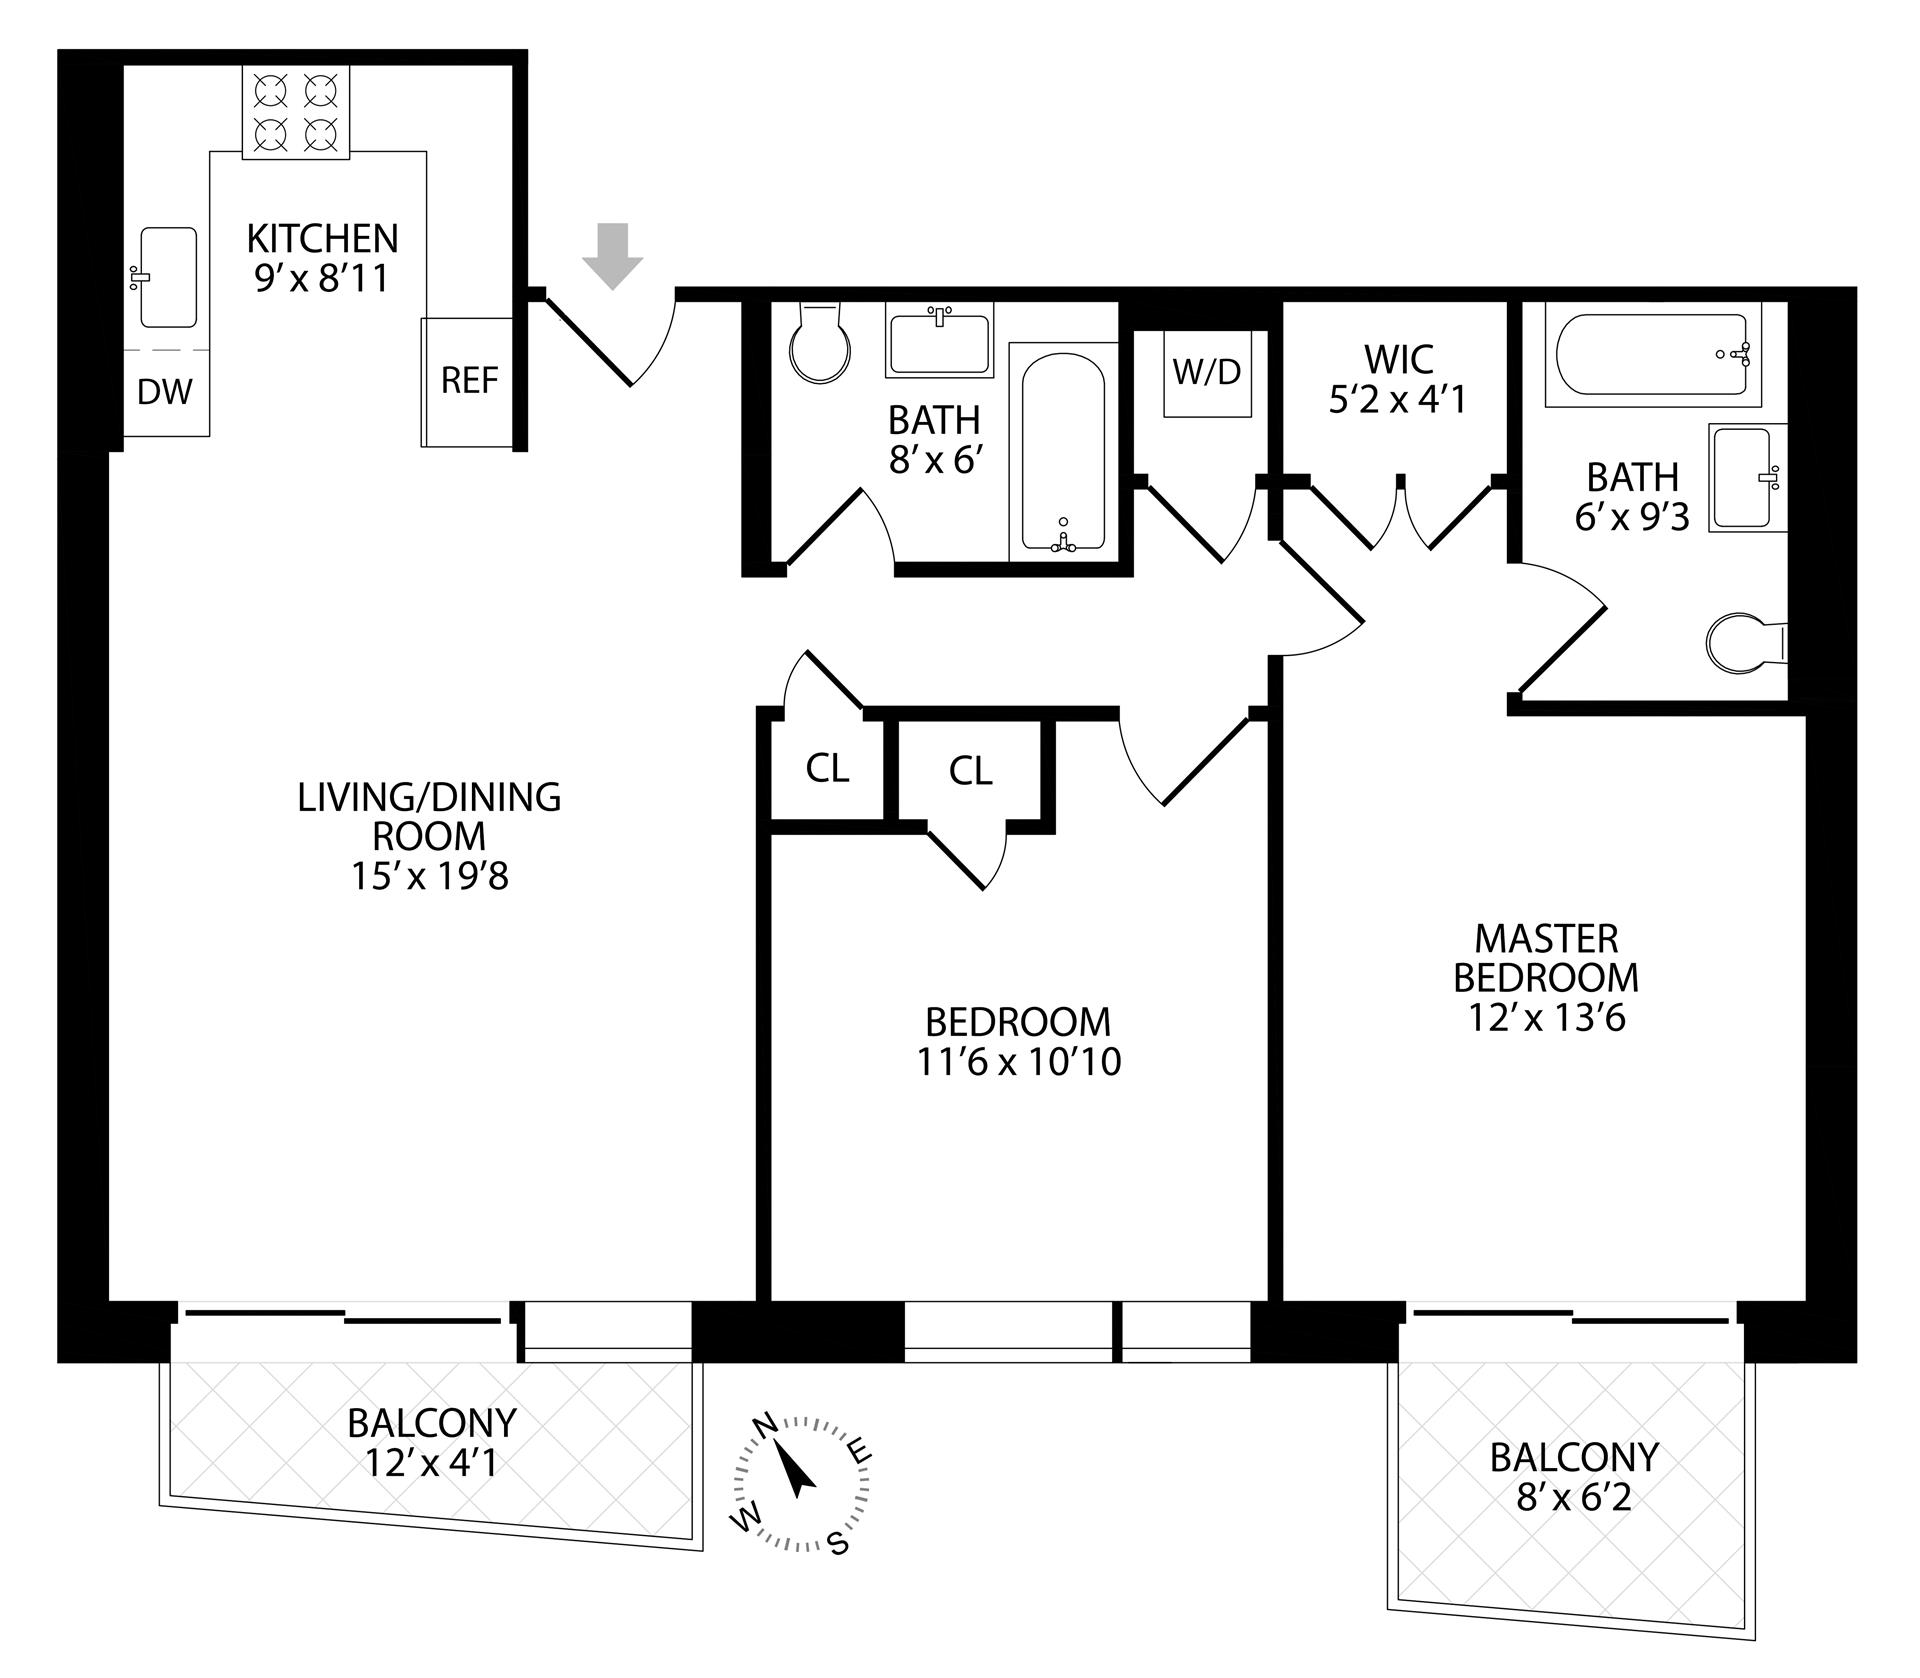 Floor plan of 267 Evergreen Avenue, 3A - Bushwick, New York